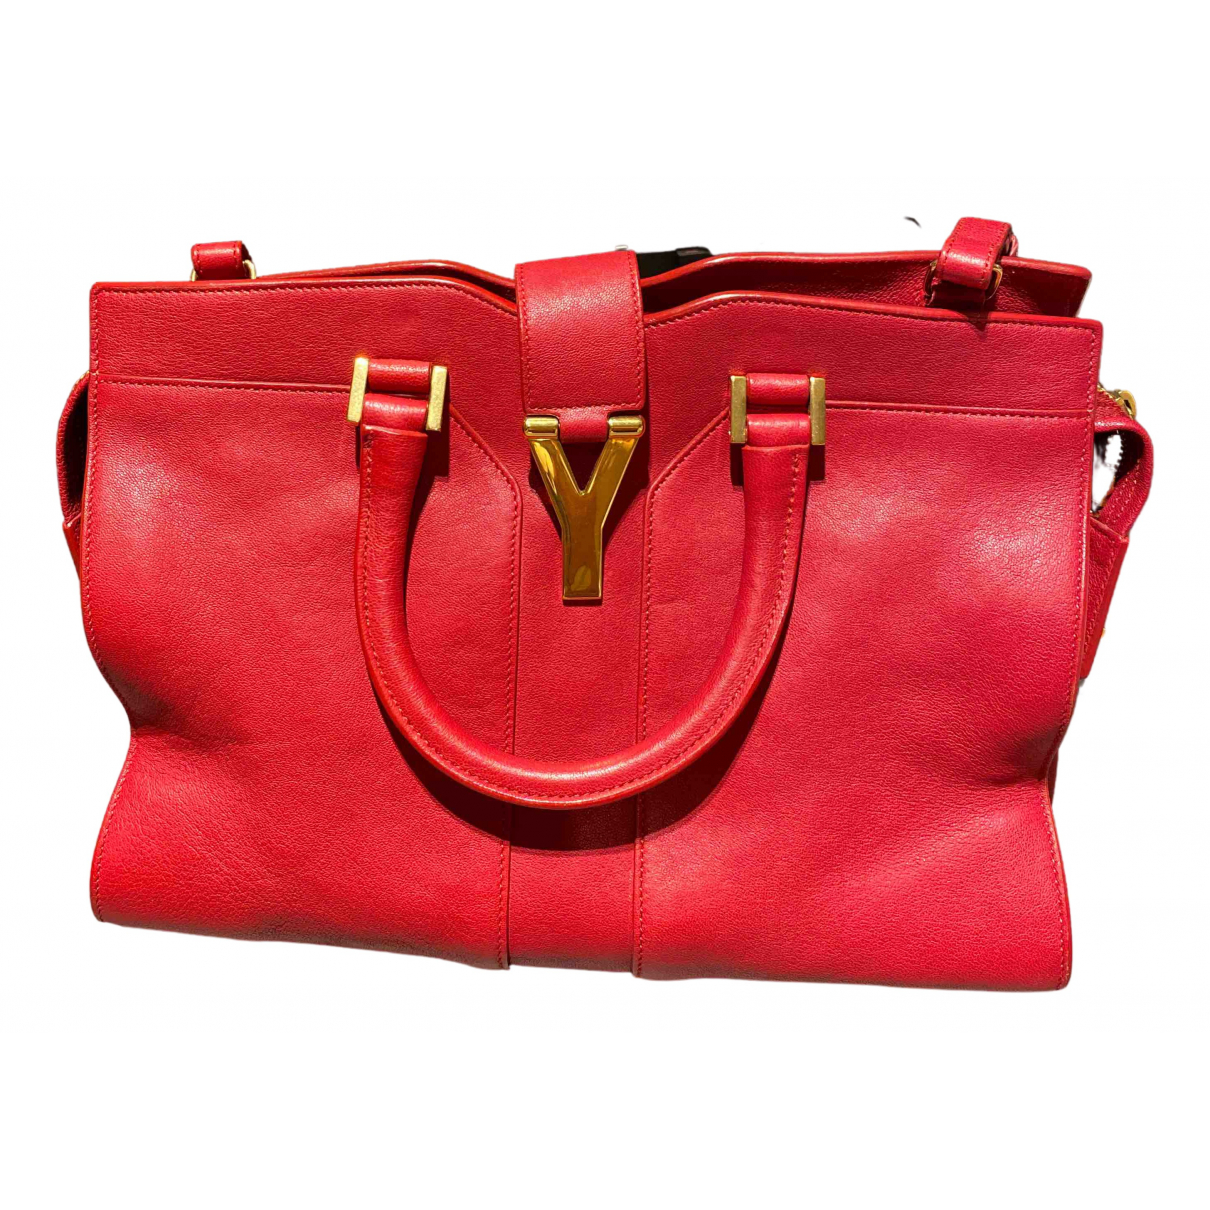 Yves Saint Laurent Chyc Red Leather handbag for Women N